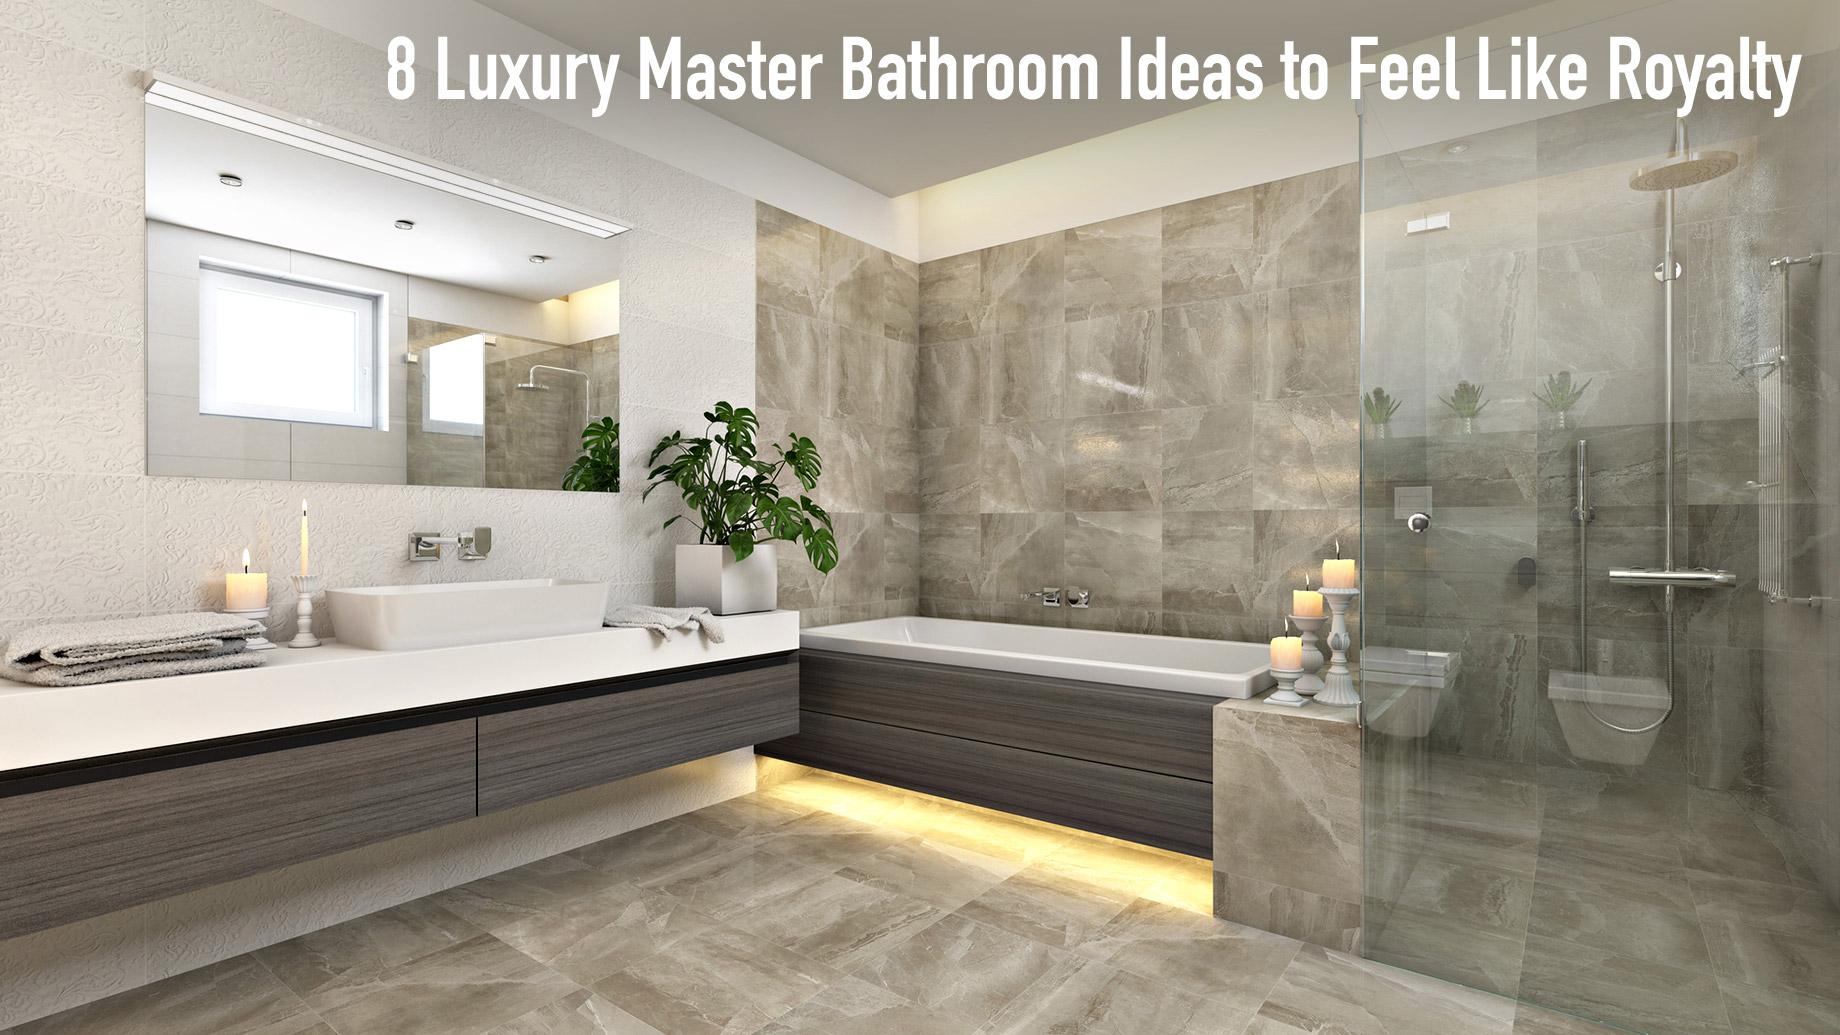 8 Luxury Master Bathroom Ideas to Feel Like Royalty